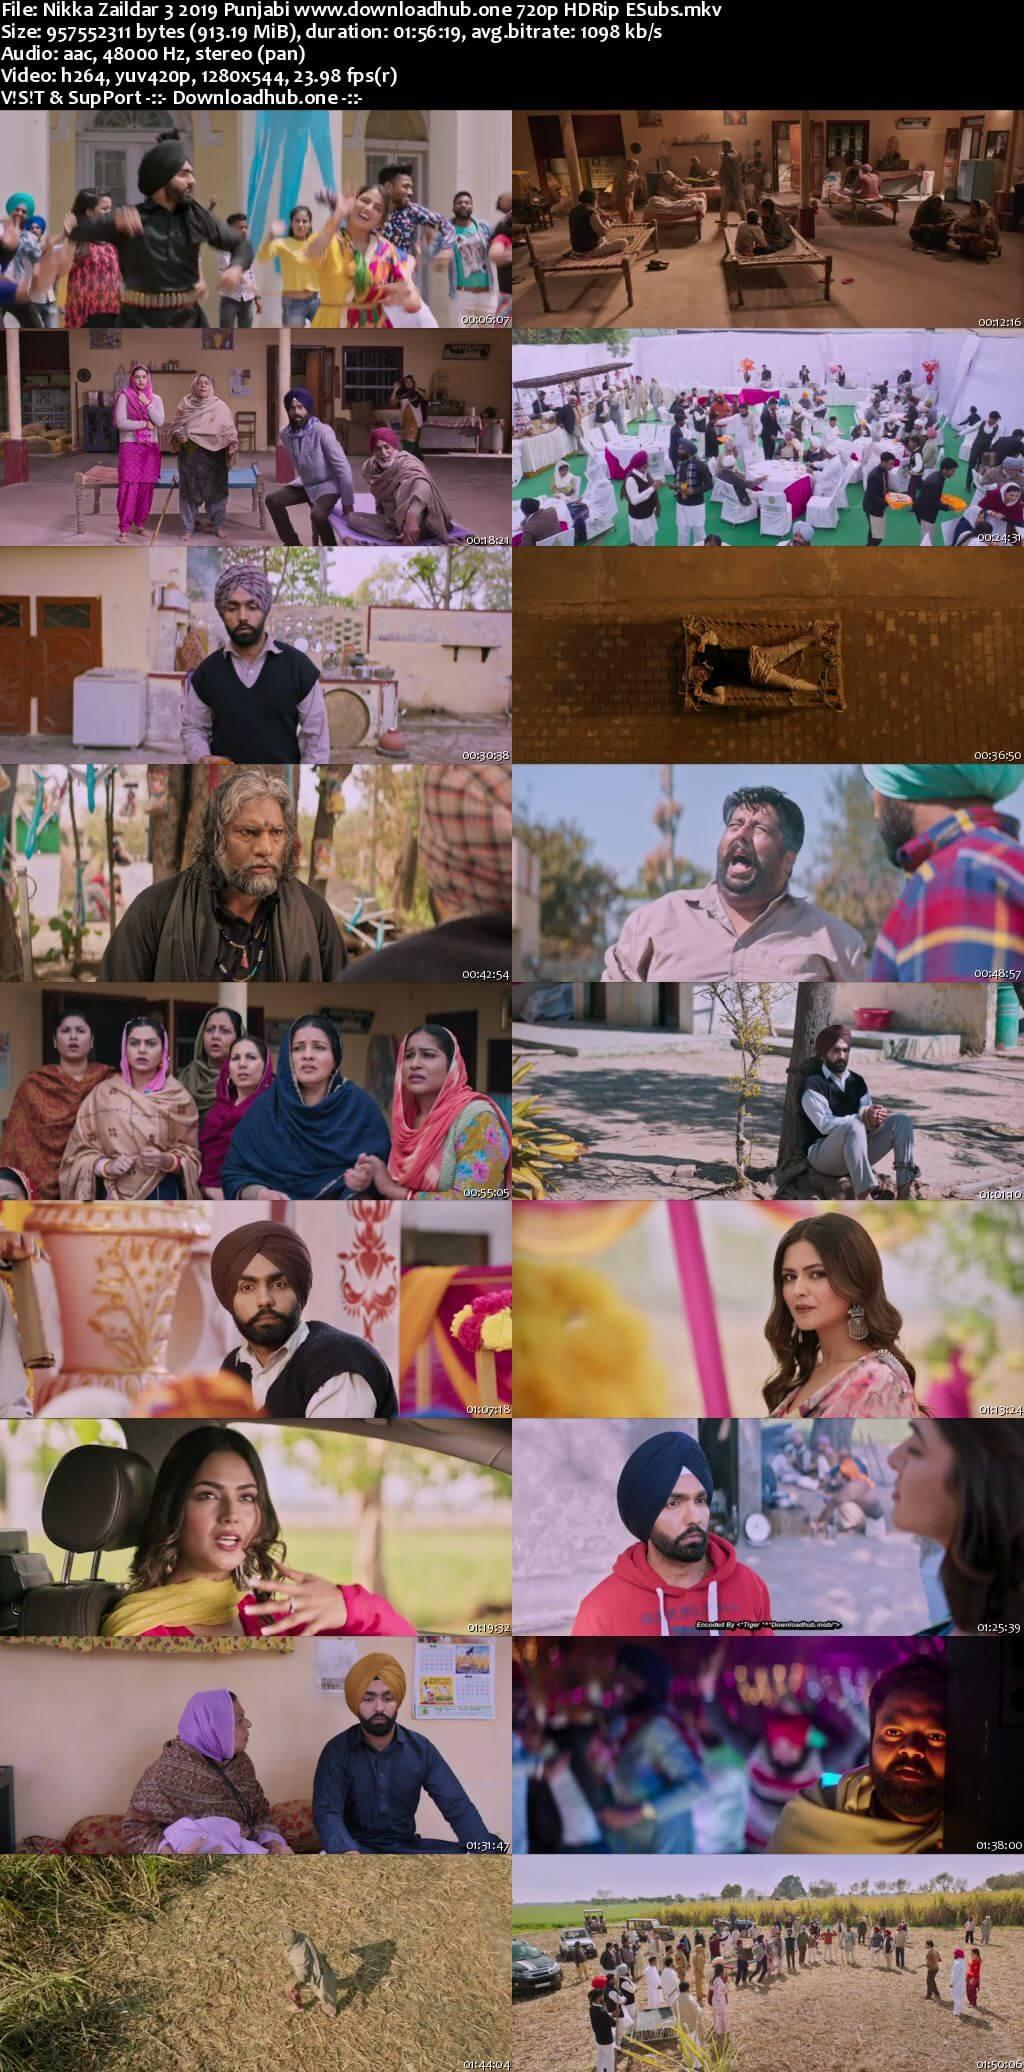 Nikka Zaildar 3 2019 Punjabi 720p HDRip ESubs